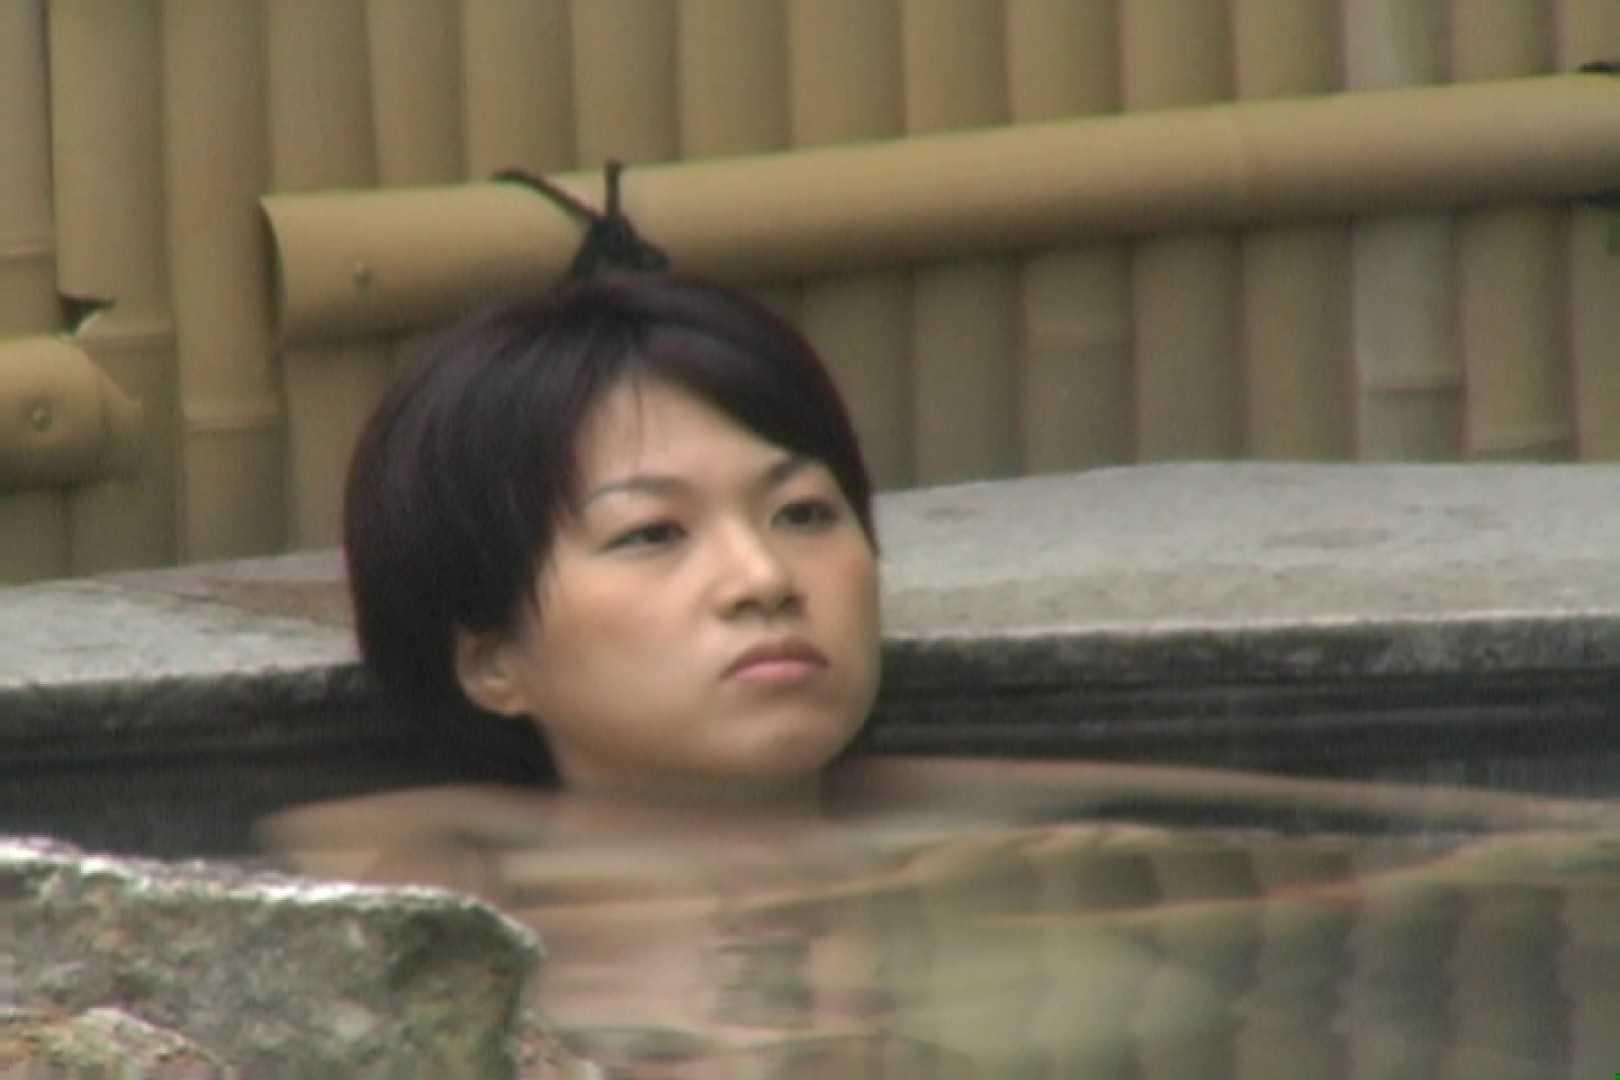 Aquaな露天風呂Vol.624 露天   OLセックス  52画像 34